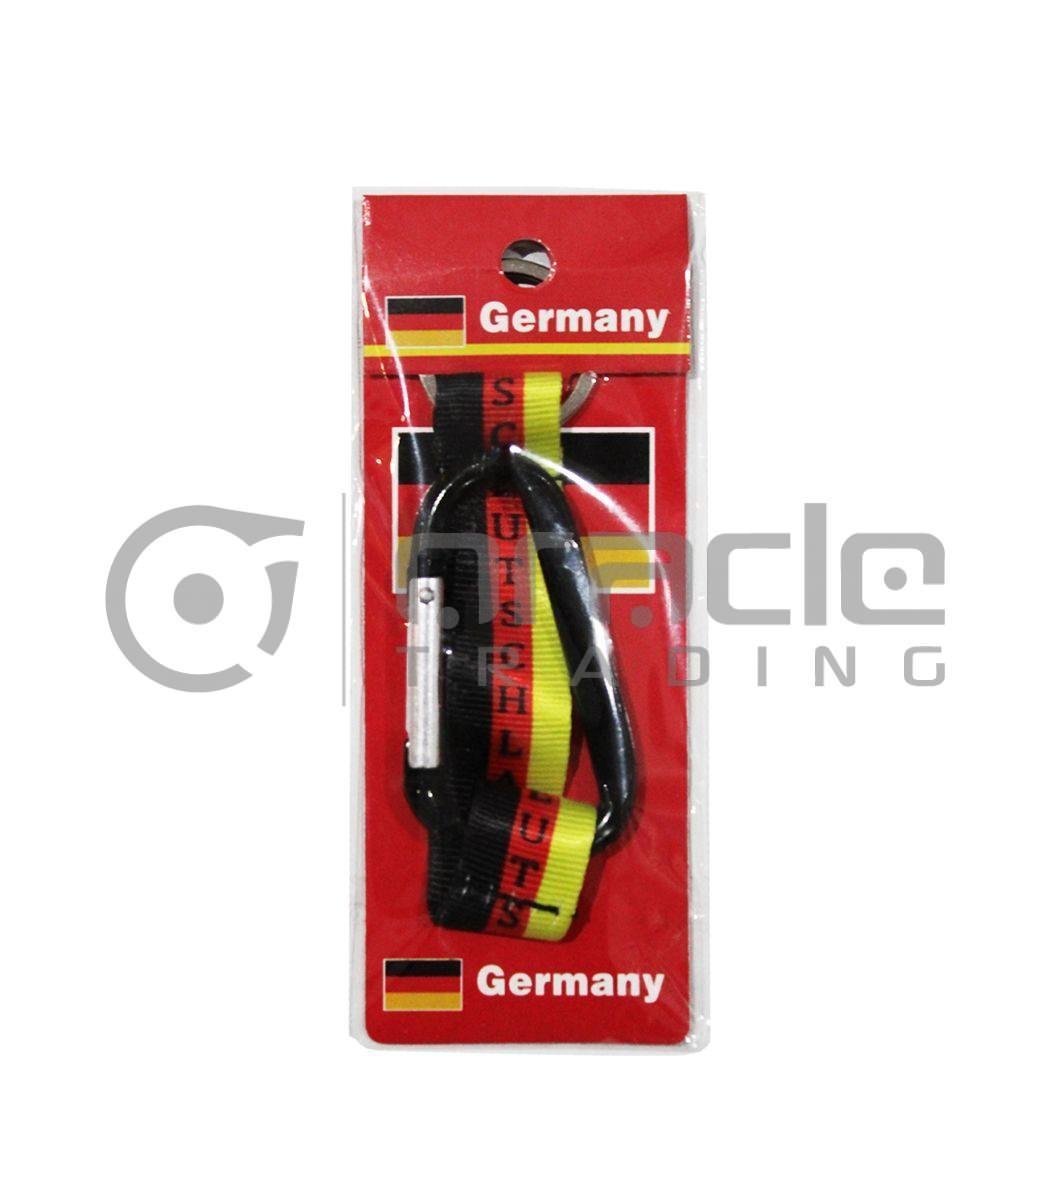 Germany Mini Lanyard Keychain 12-Pack